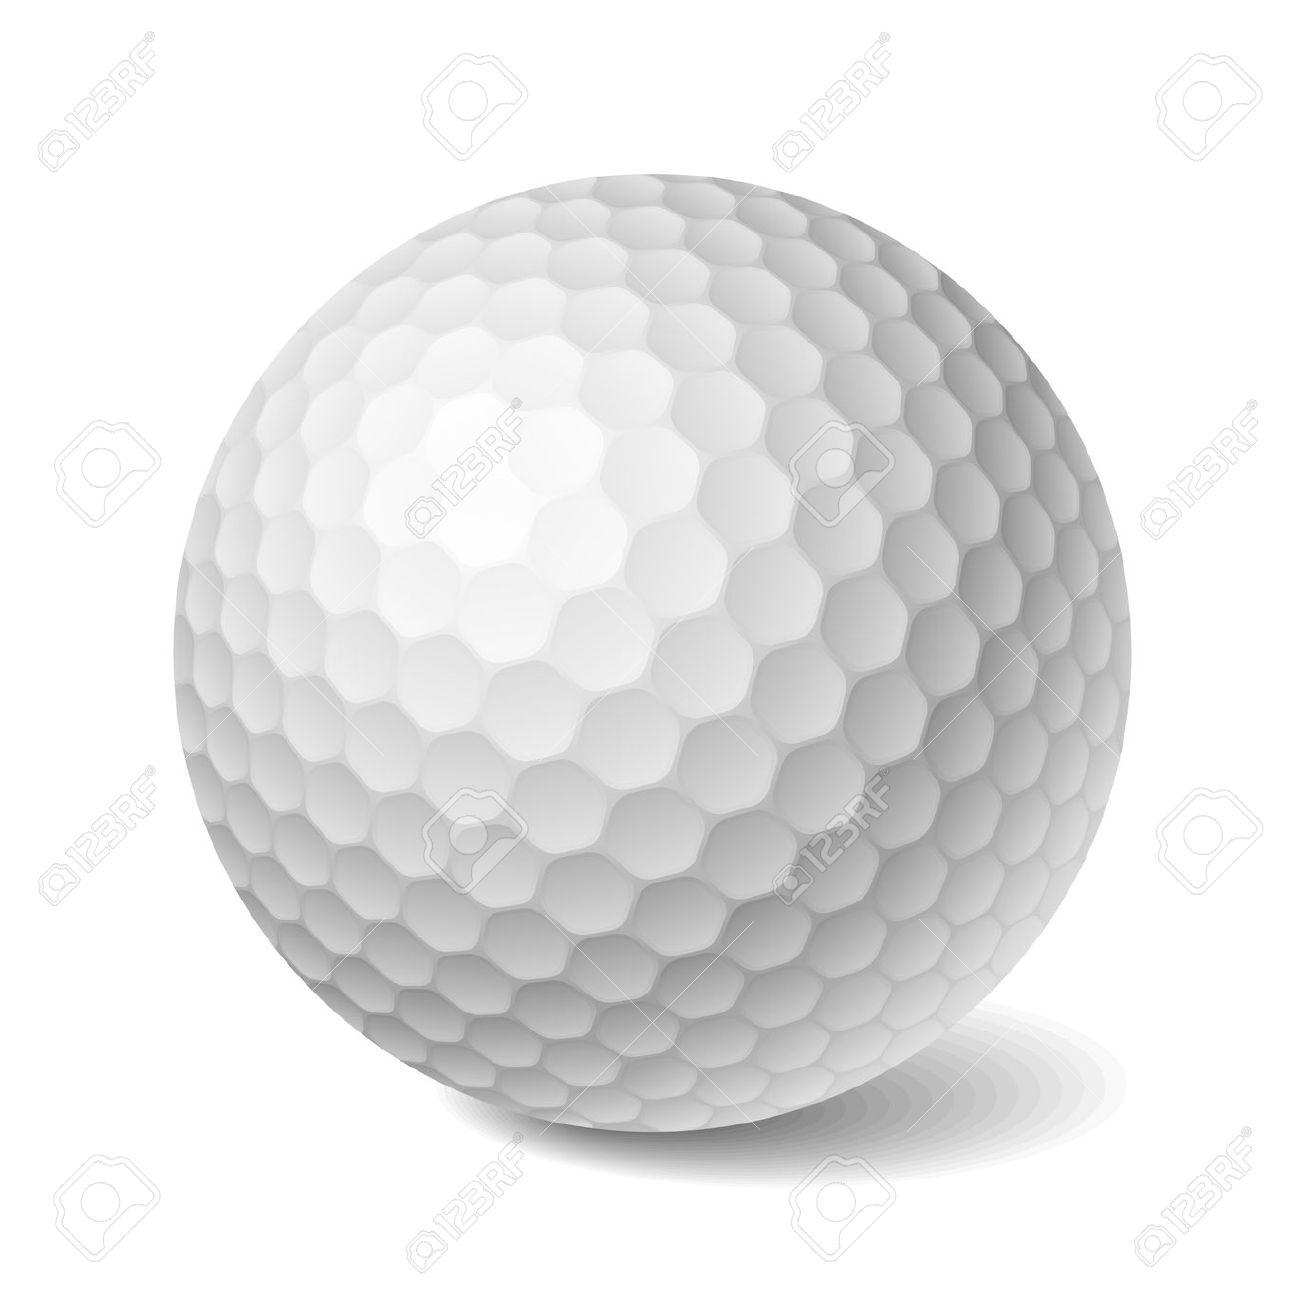 Golf ball vector clipart clipart transparent stock Best Golf Ball Clipart #12407 - Clipartion.com clipart transparent stock